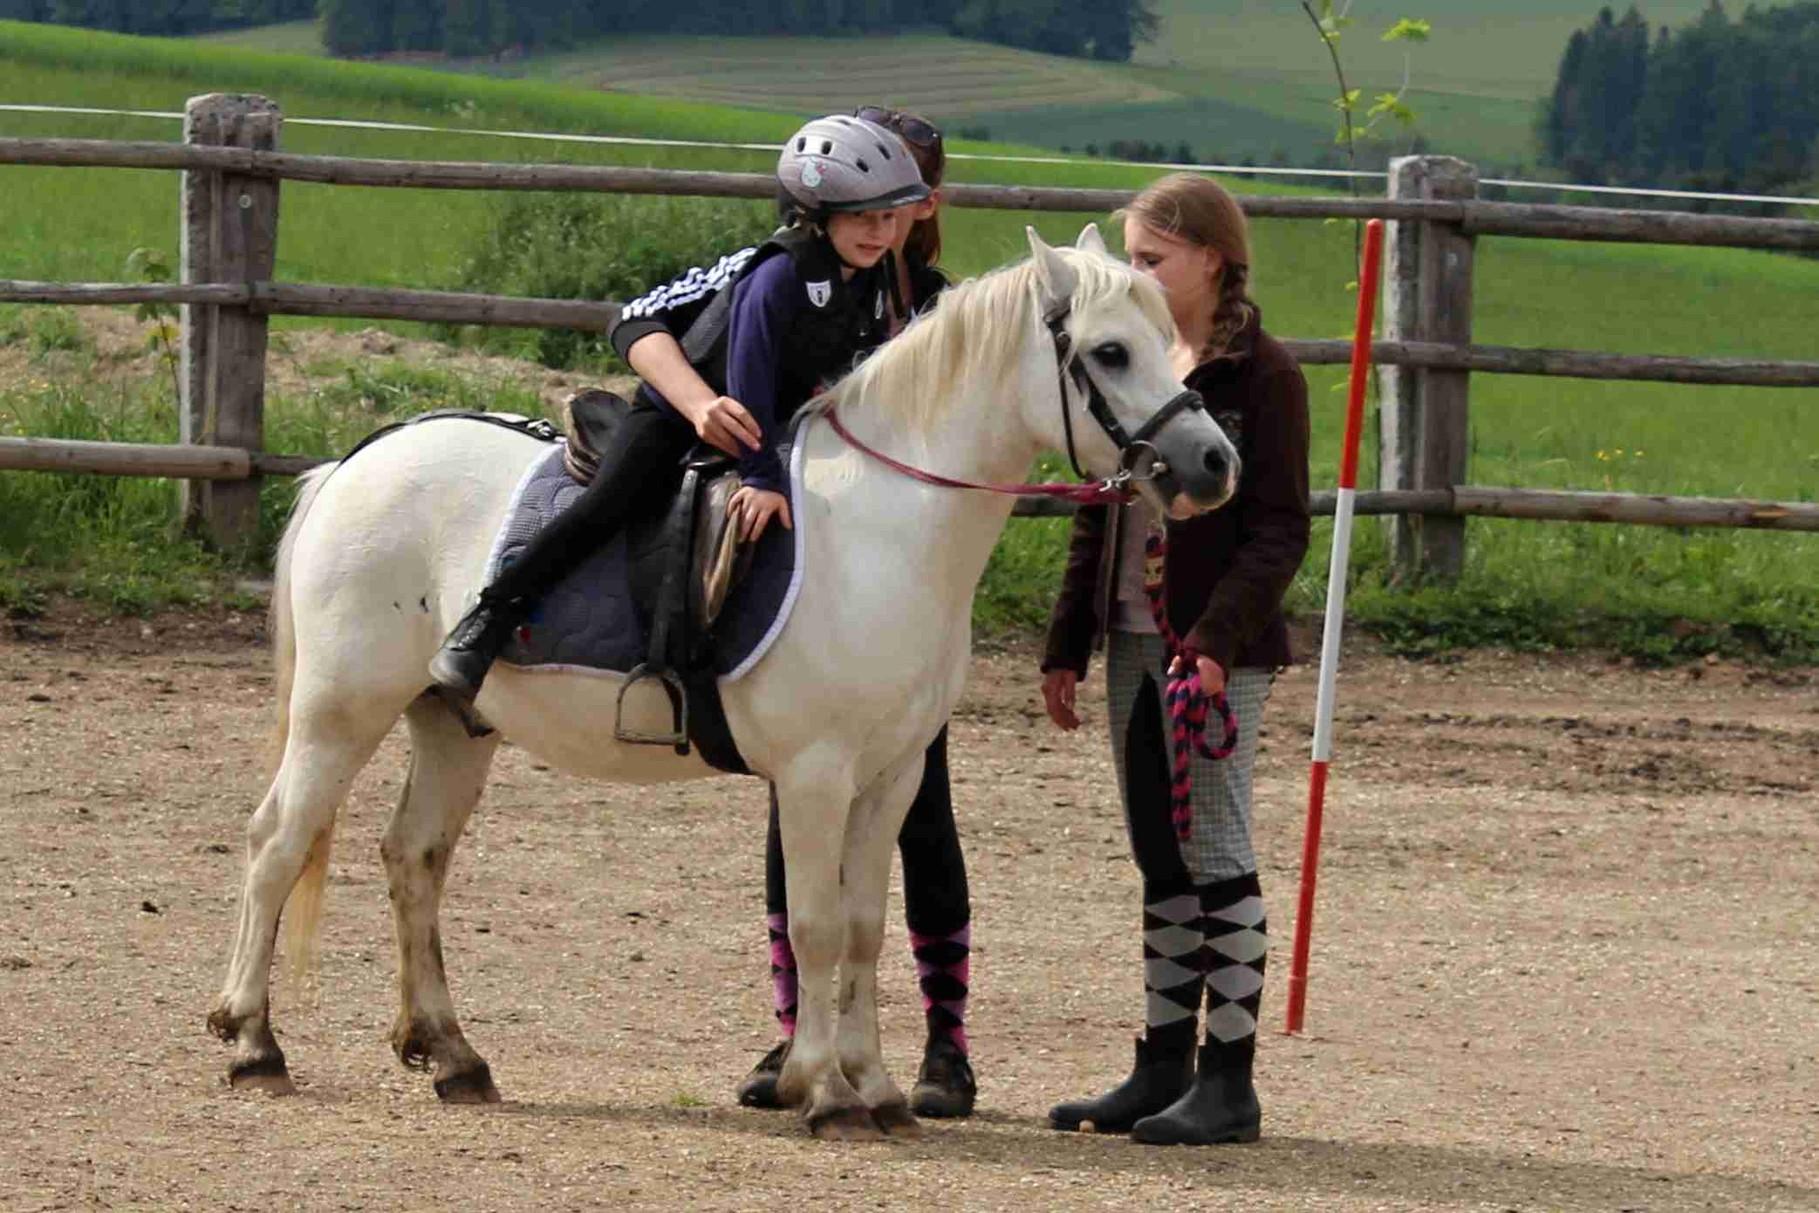 korrektes Absteigen vom Pony